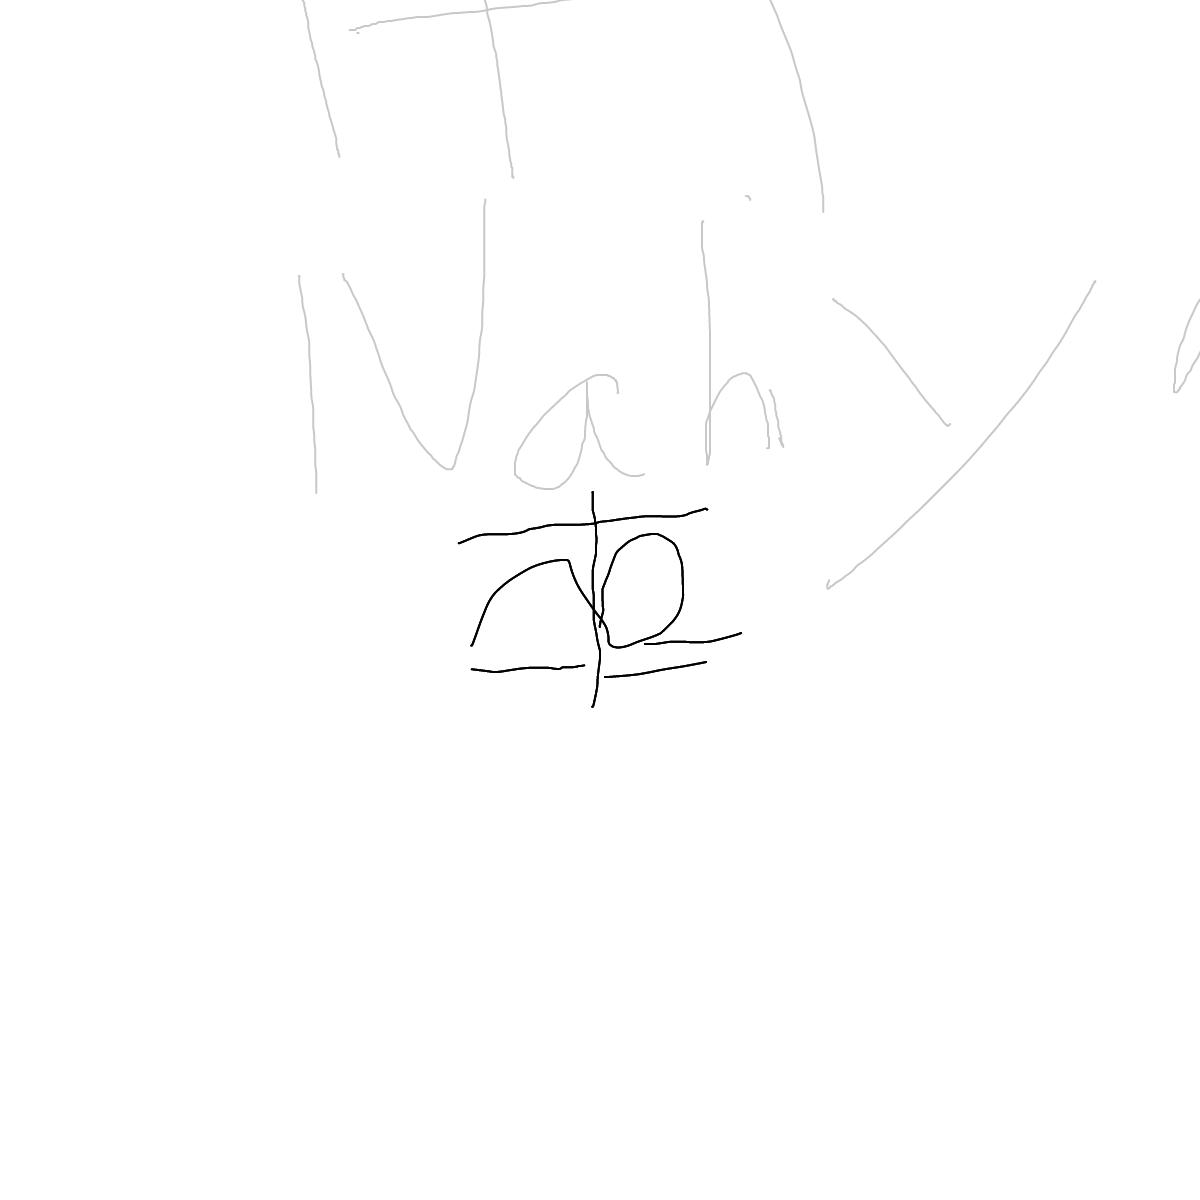 BAAAM drawing#15626 lat:44.9392204284668000lng: -93.1674041748046900